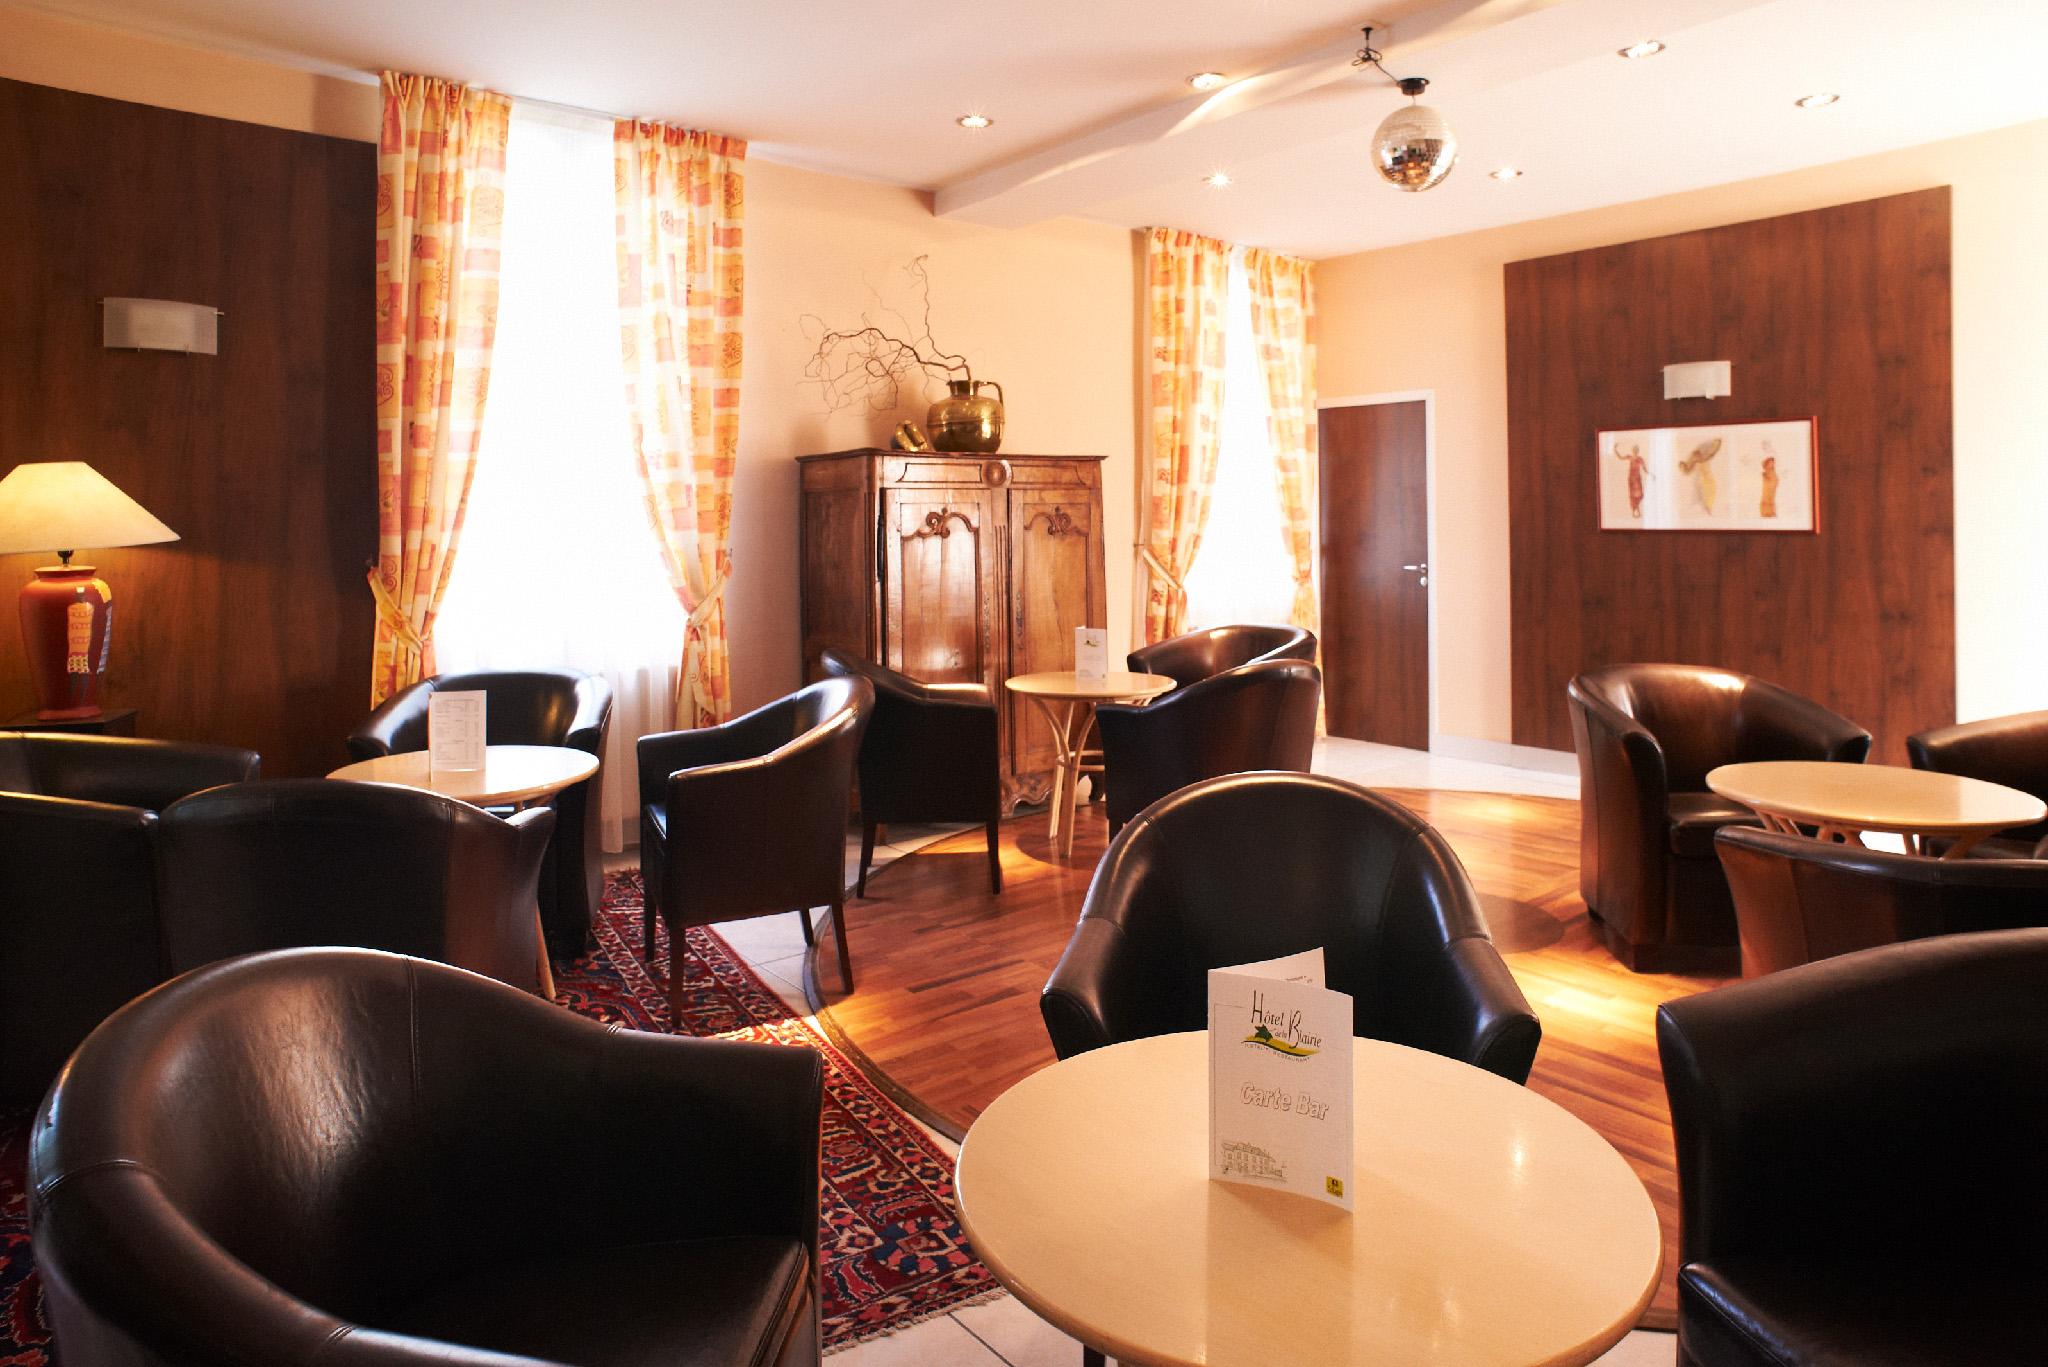 22_photographie_hotel_restaurant_nantes